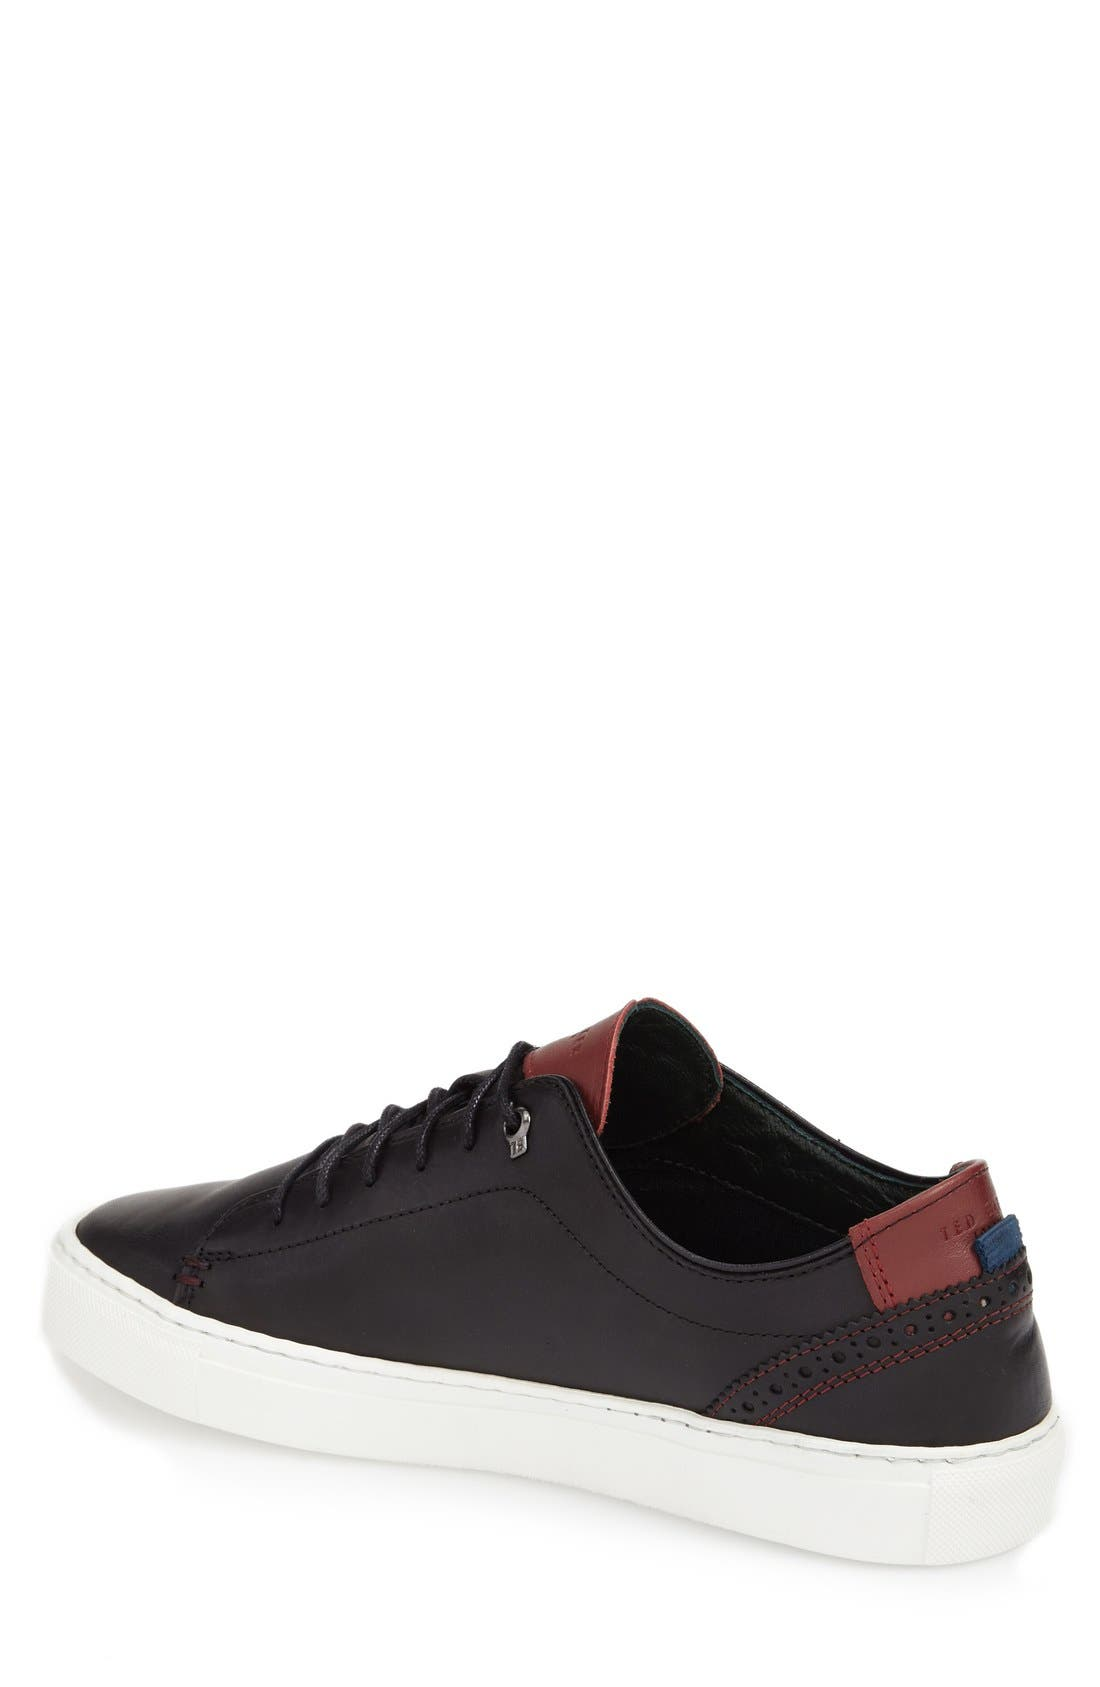 'Kiing Classic' Sneaker,                             Alternate thumbnail 6, color,                             001